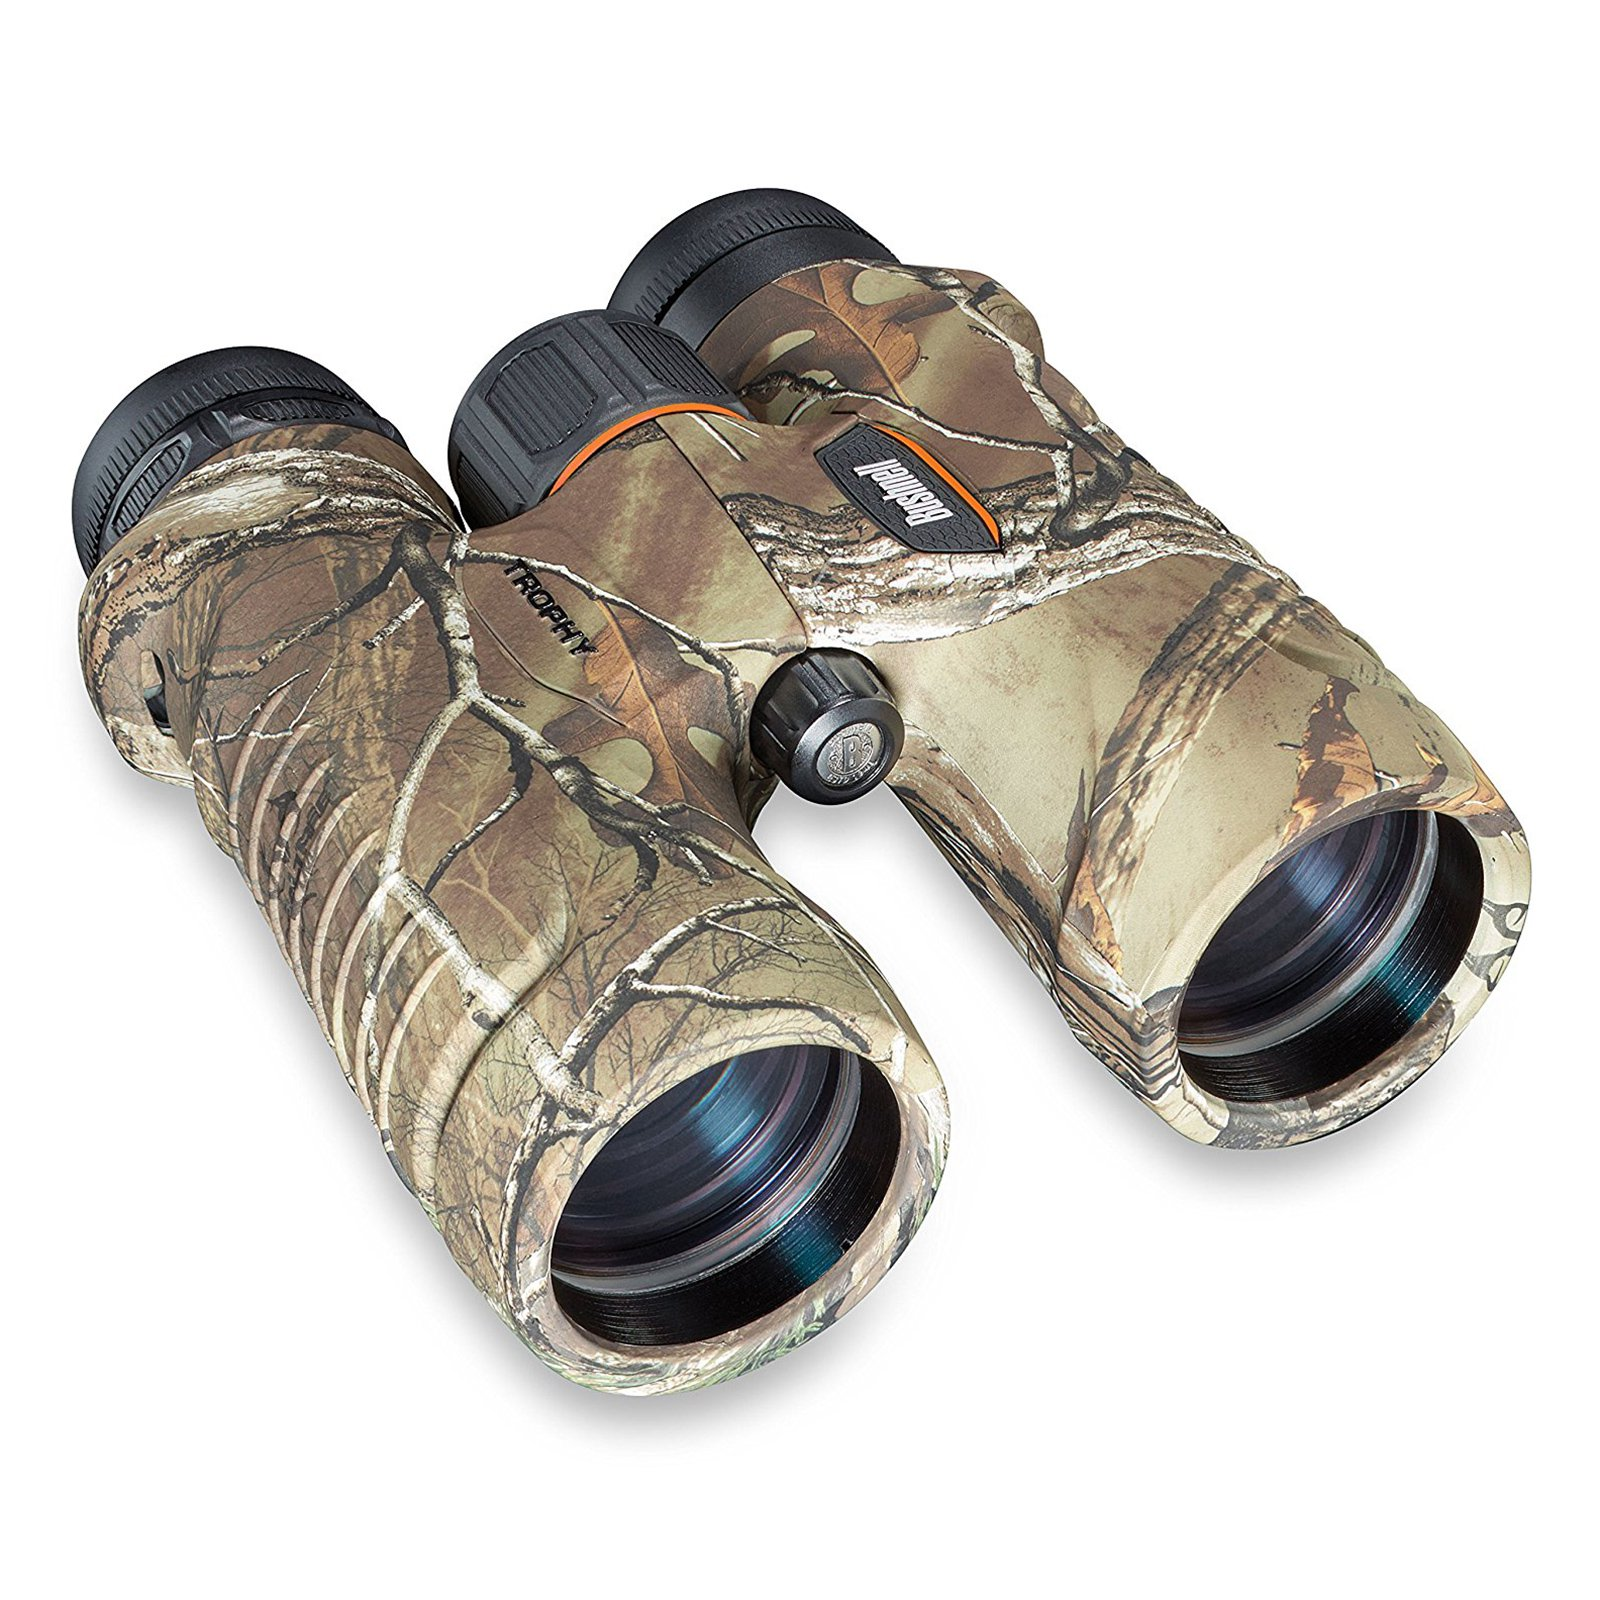 Bushnell 8x42 Trophy Hunting Binocular (RealTree RTX Camo) - 334209